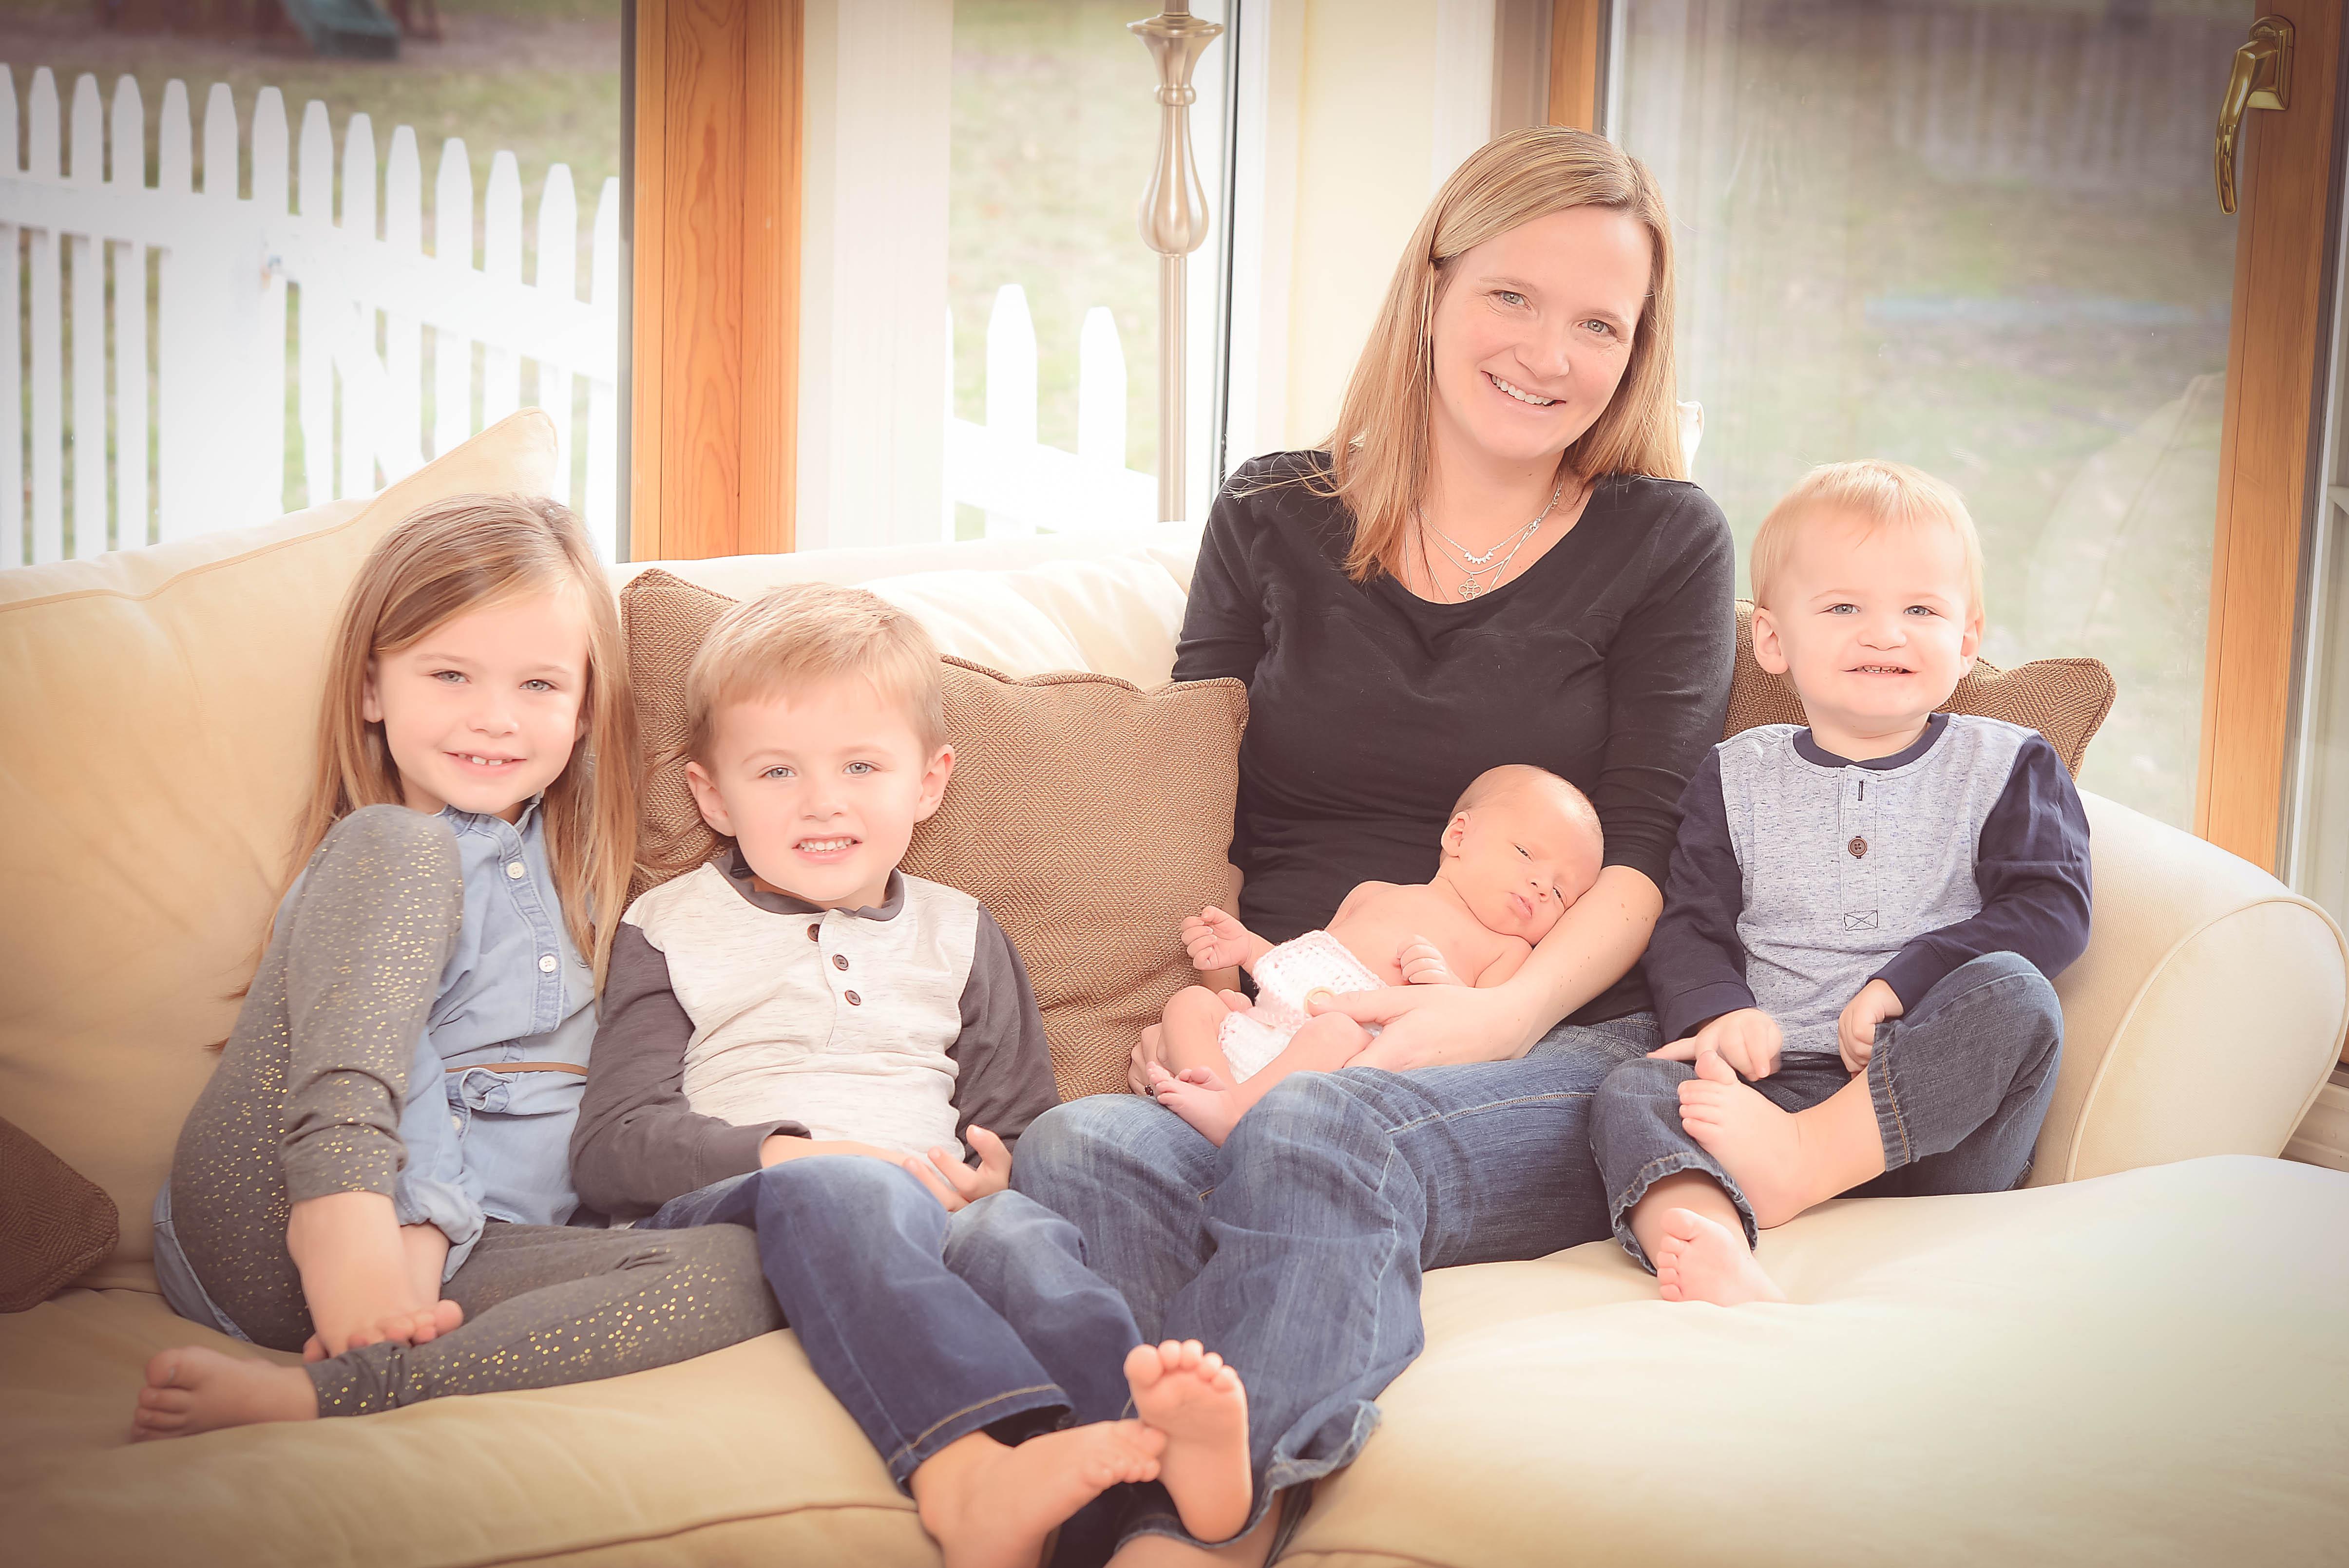 Mommy & Kids